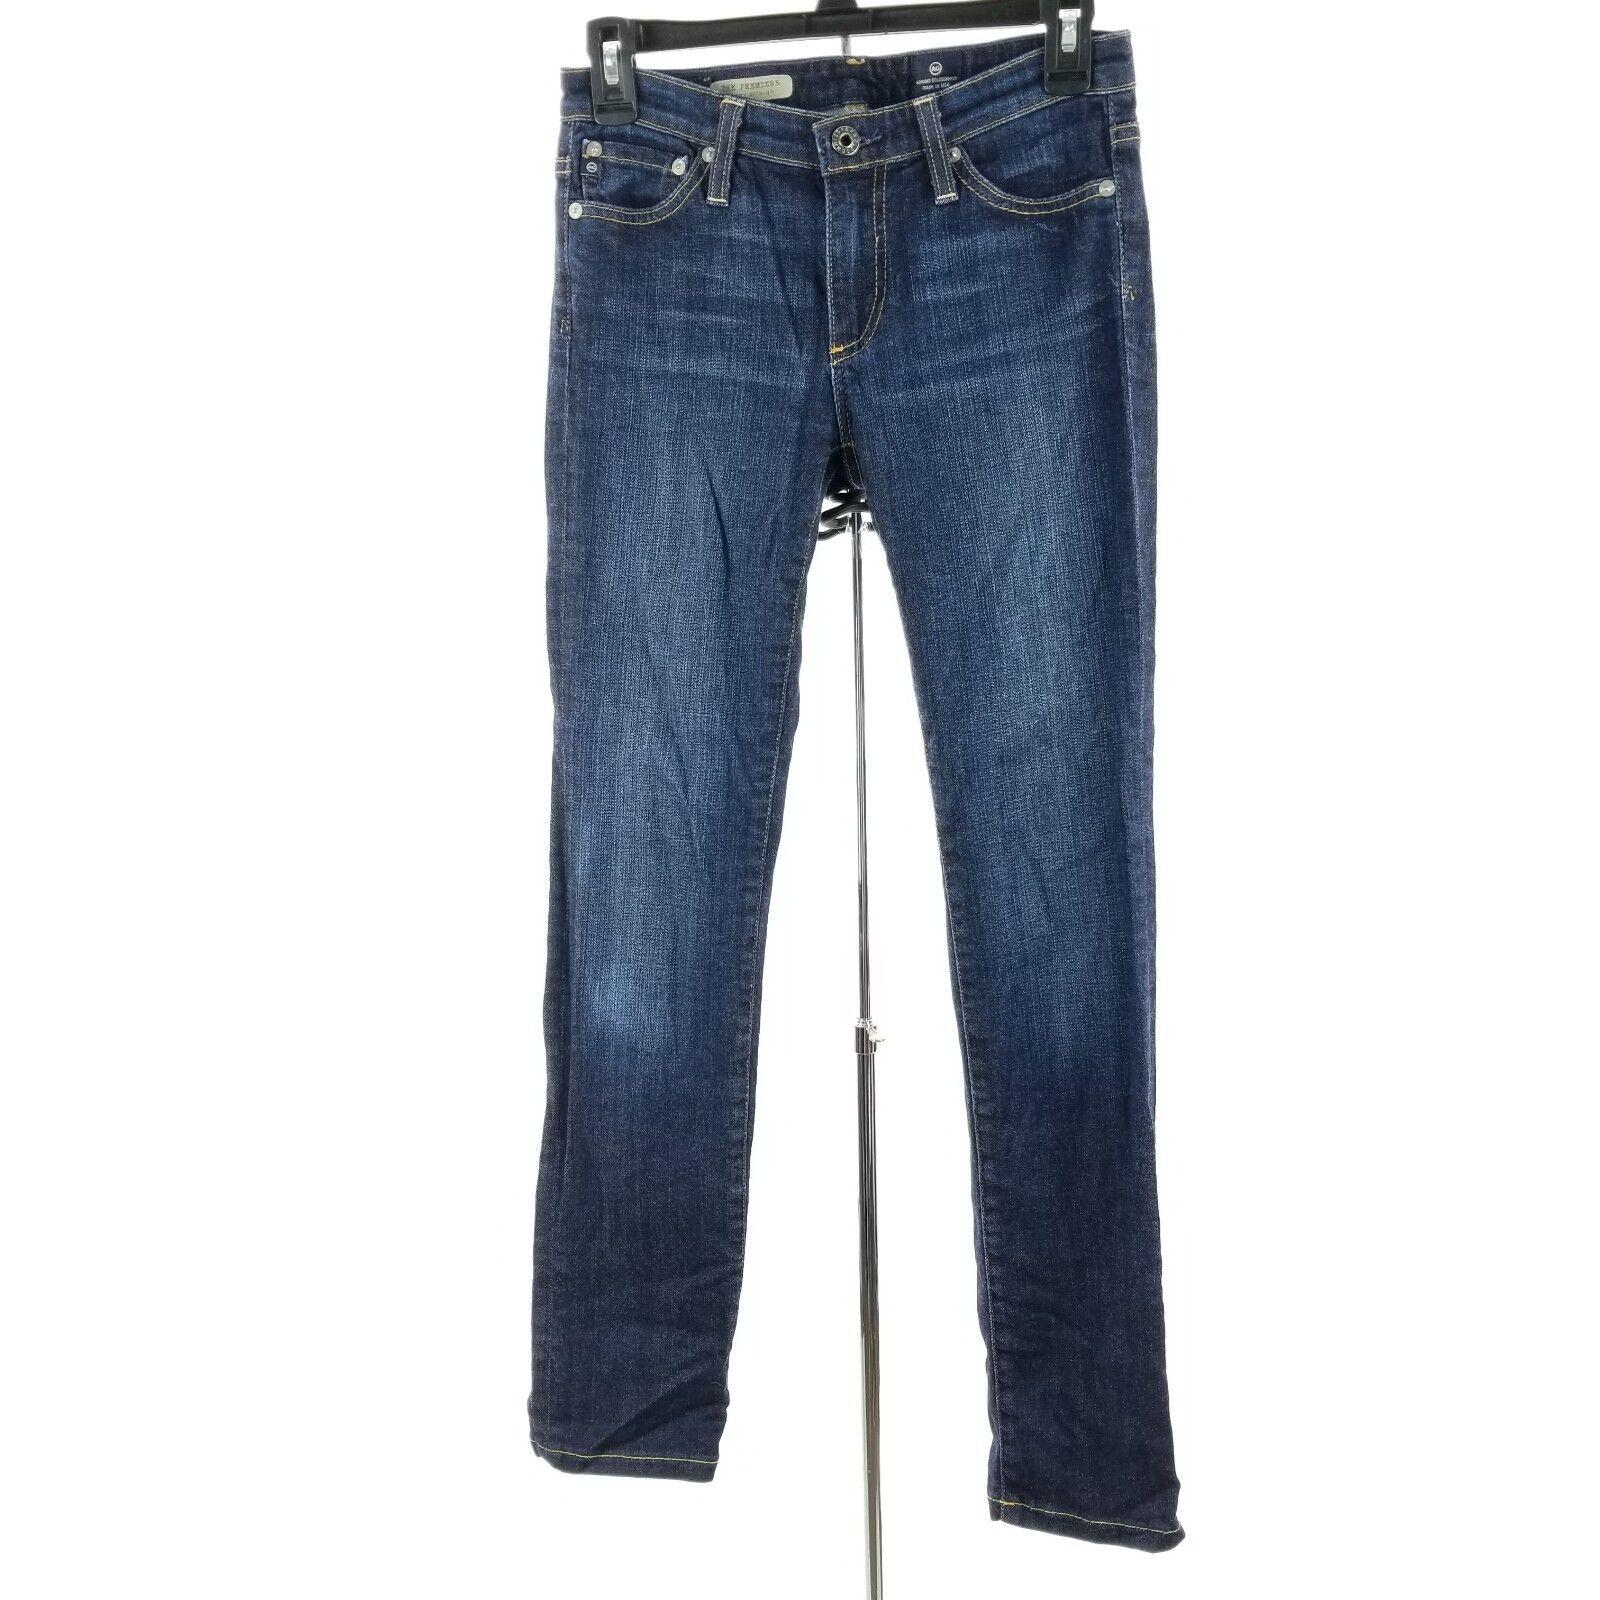 AG Adriano goldschmied Women Jeans Size 25 Premier Skinny Straight